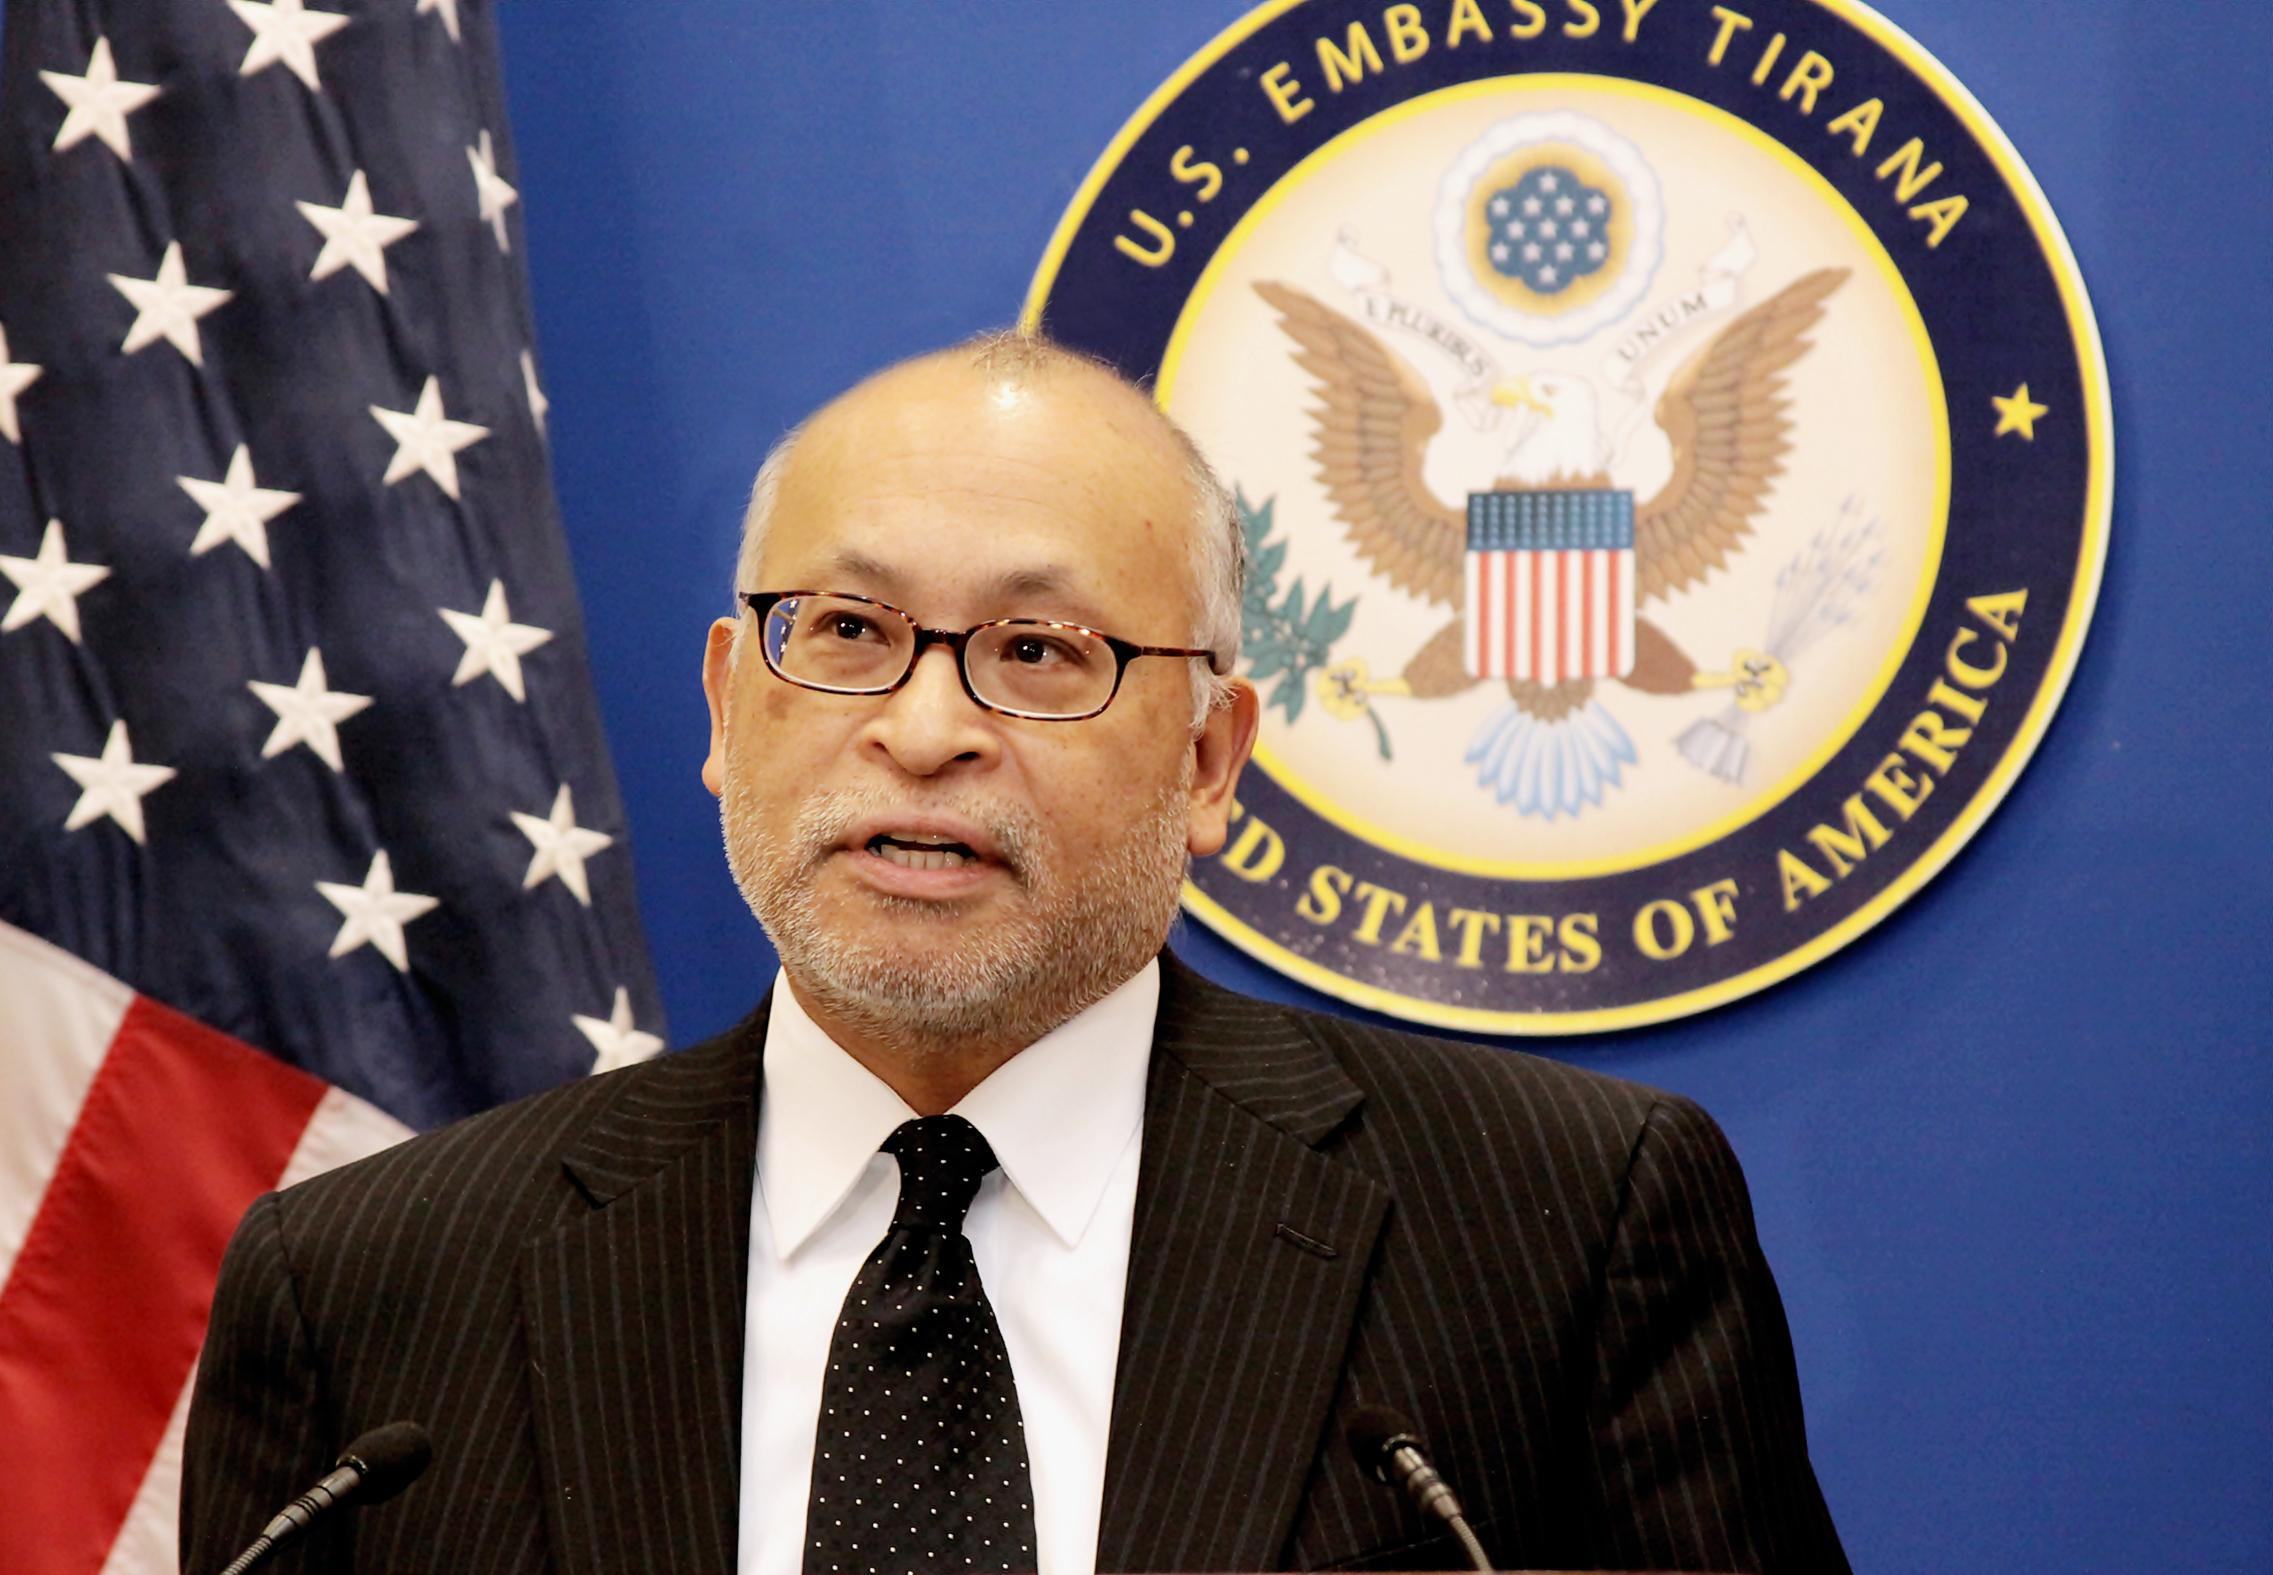 Ambassador Arvizu | U.S. Embassy in Albania